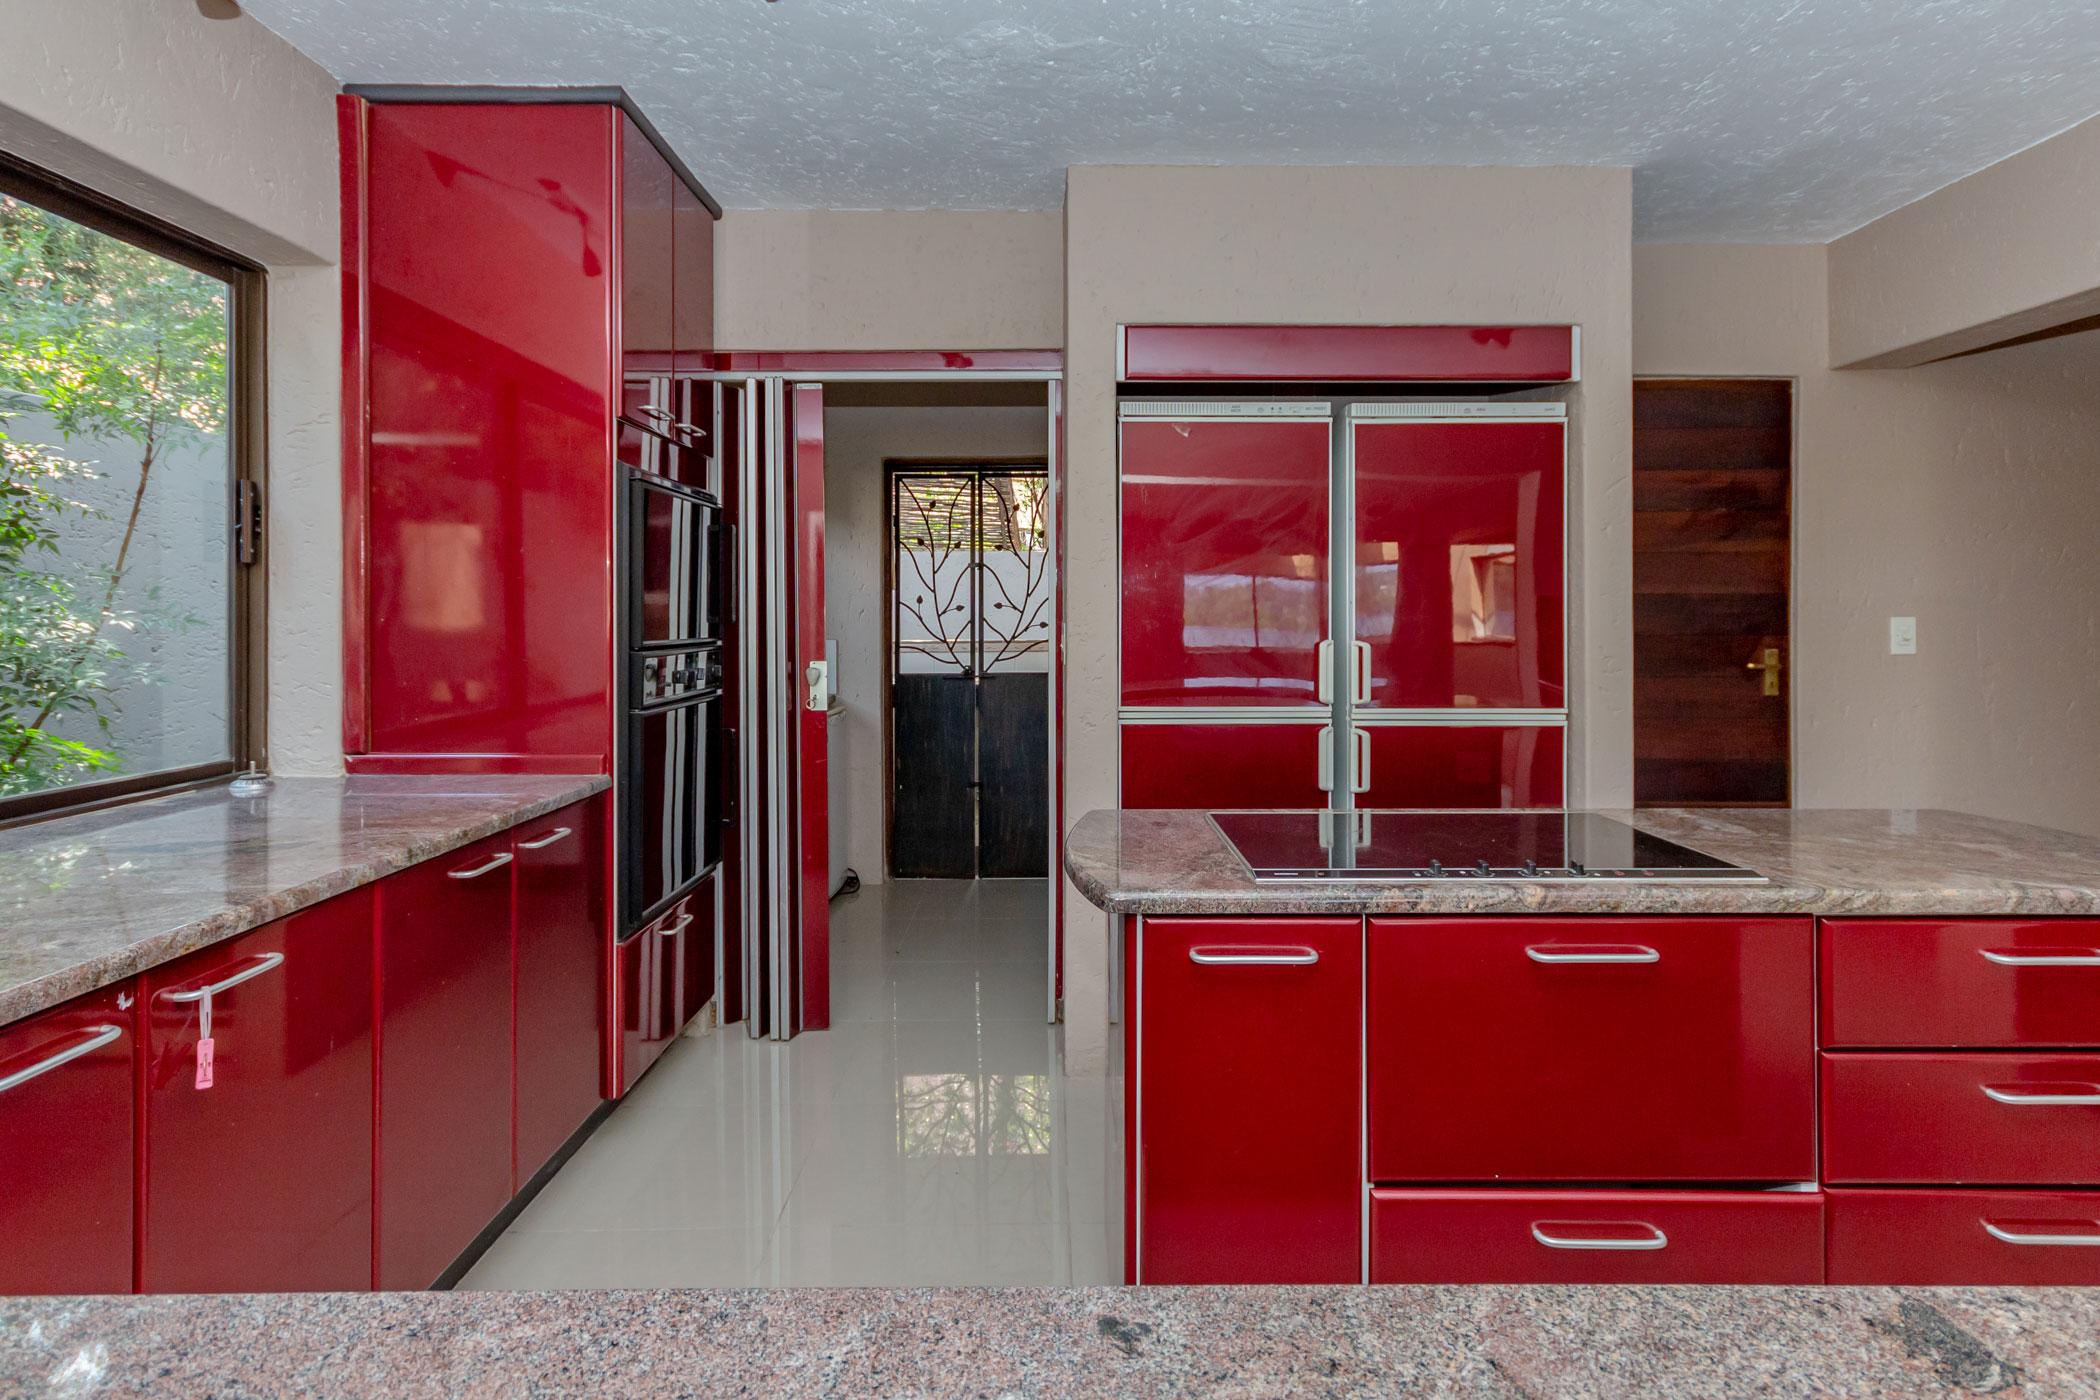 """modern kitchen Dainfern golf estate house on auction"" ""houses for auction Johannesburg"""